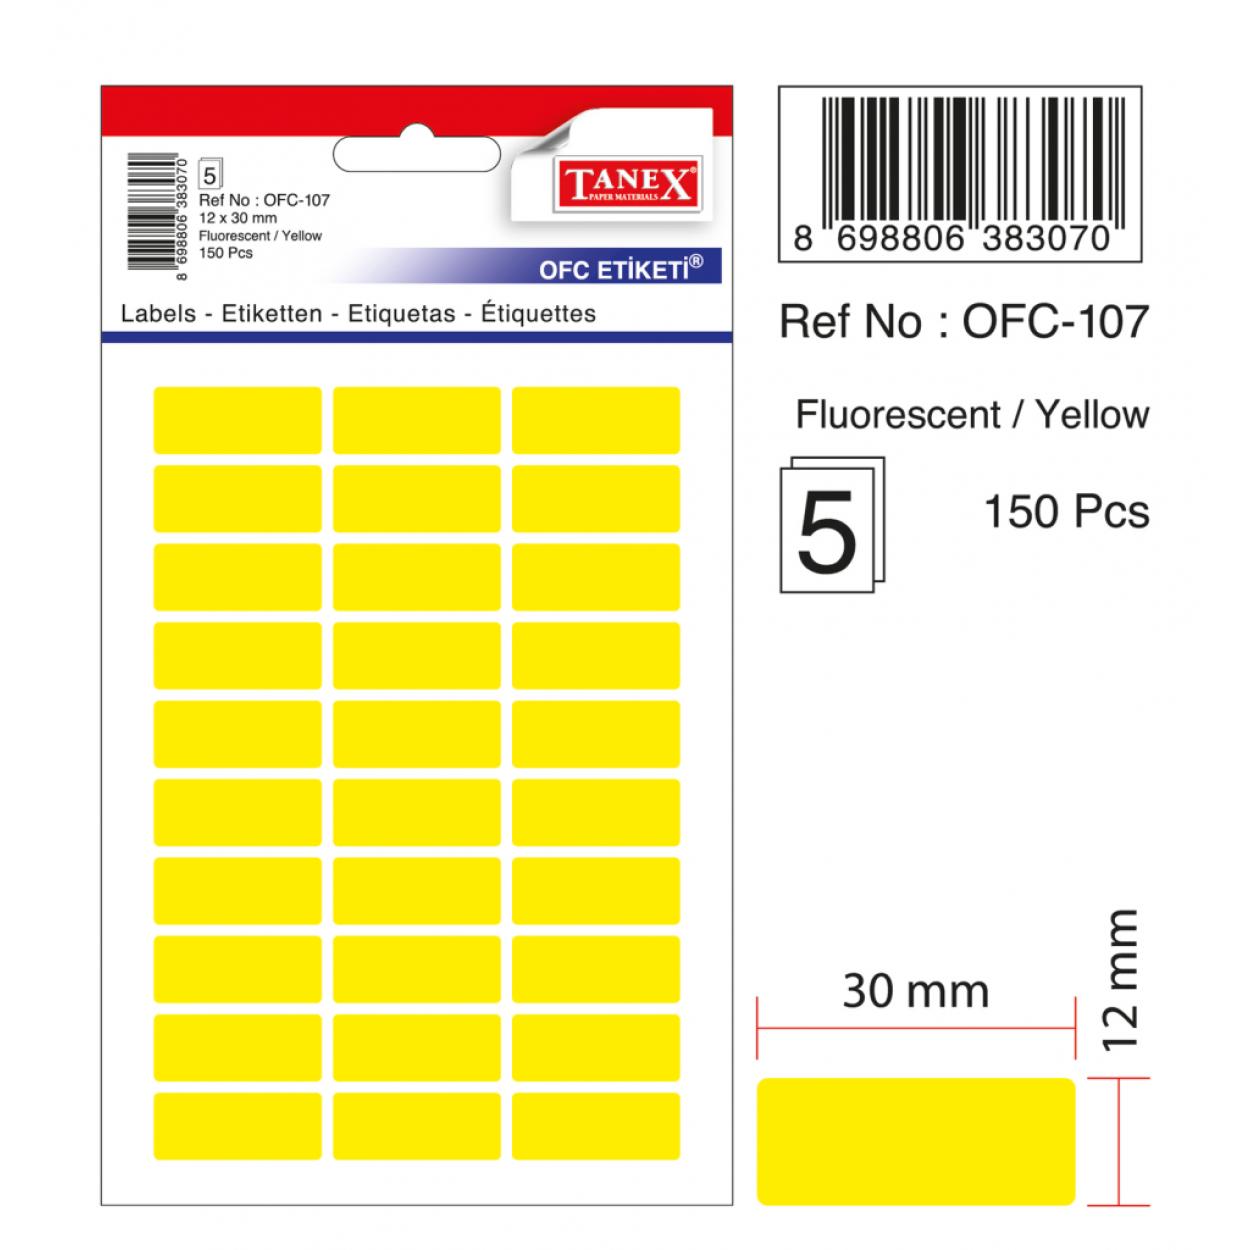 Tanex Ofc-107 Flo Sarı Ofis Etiketi